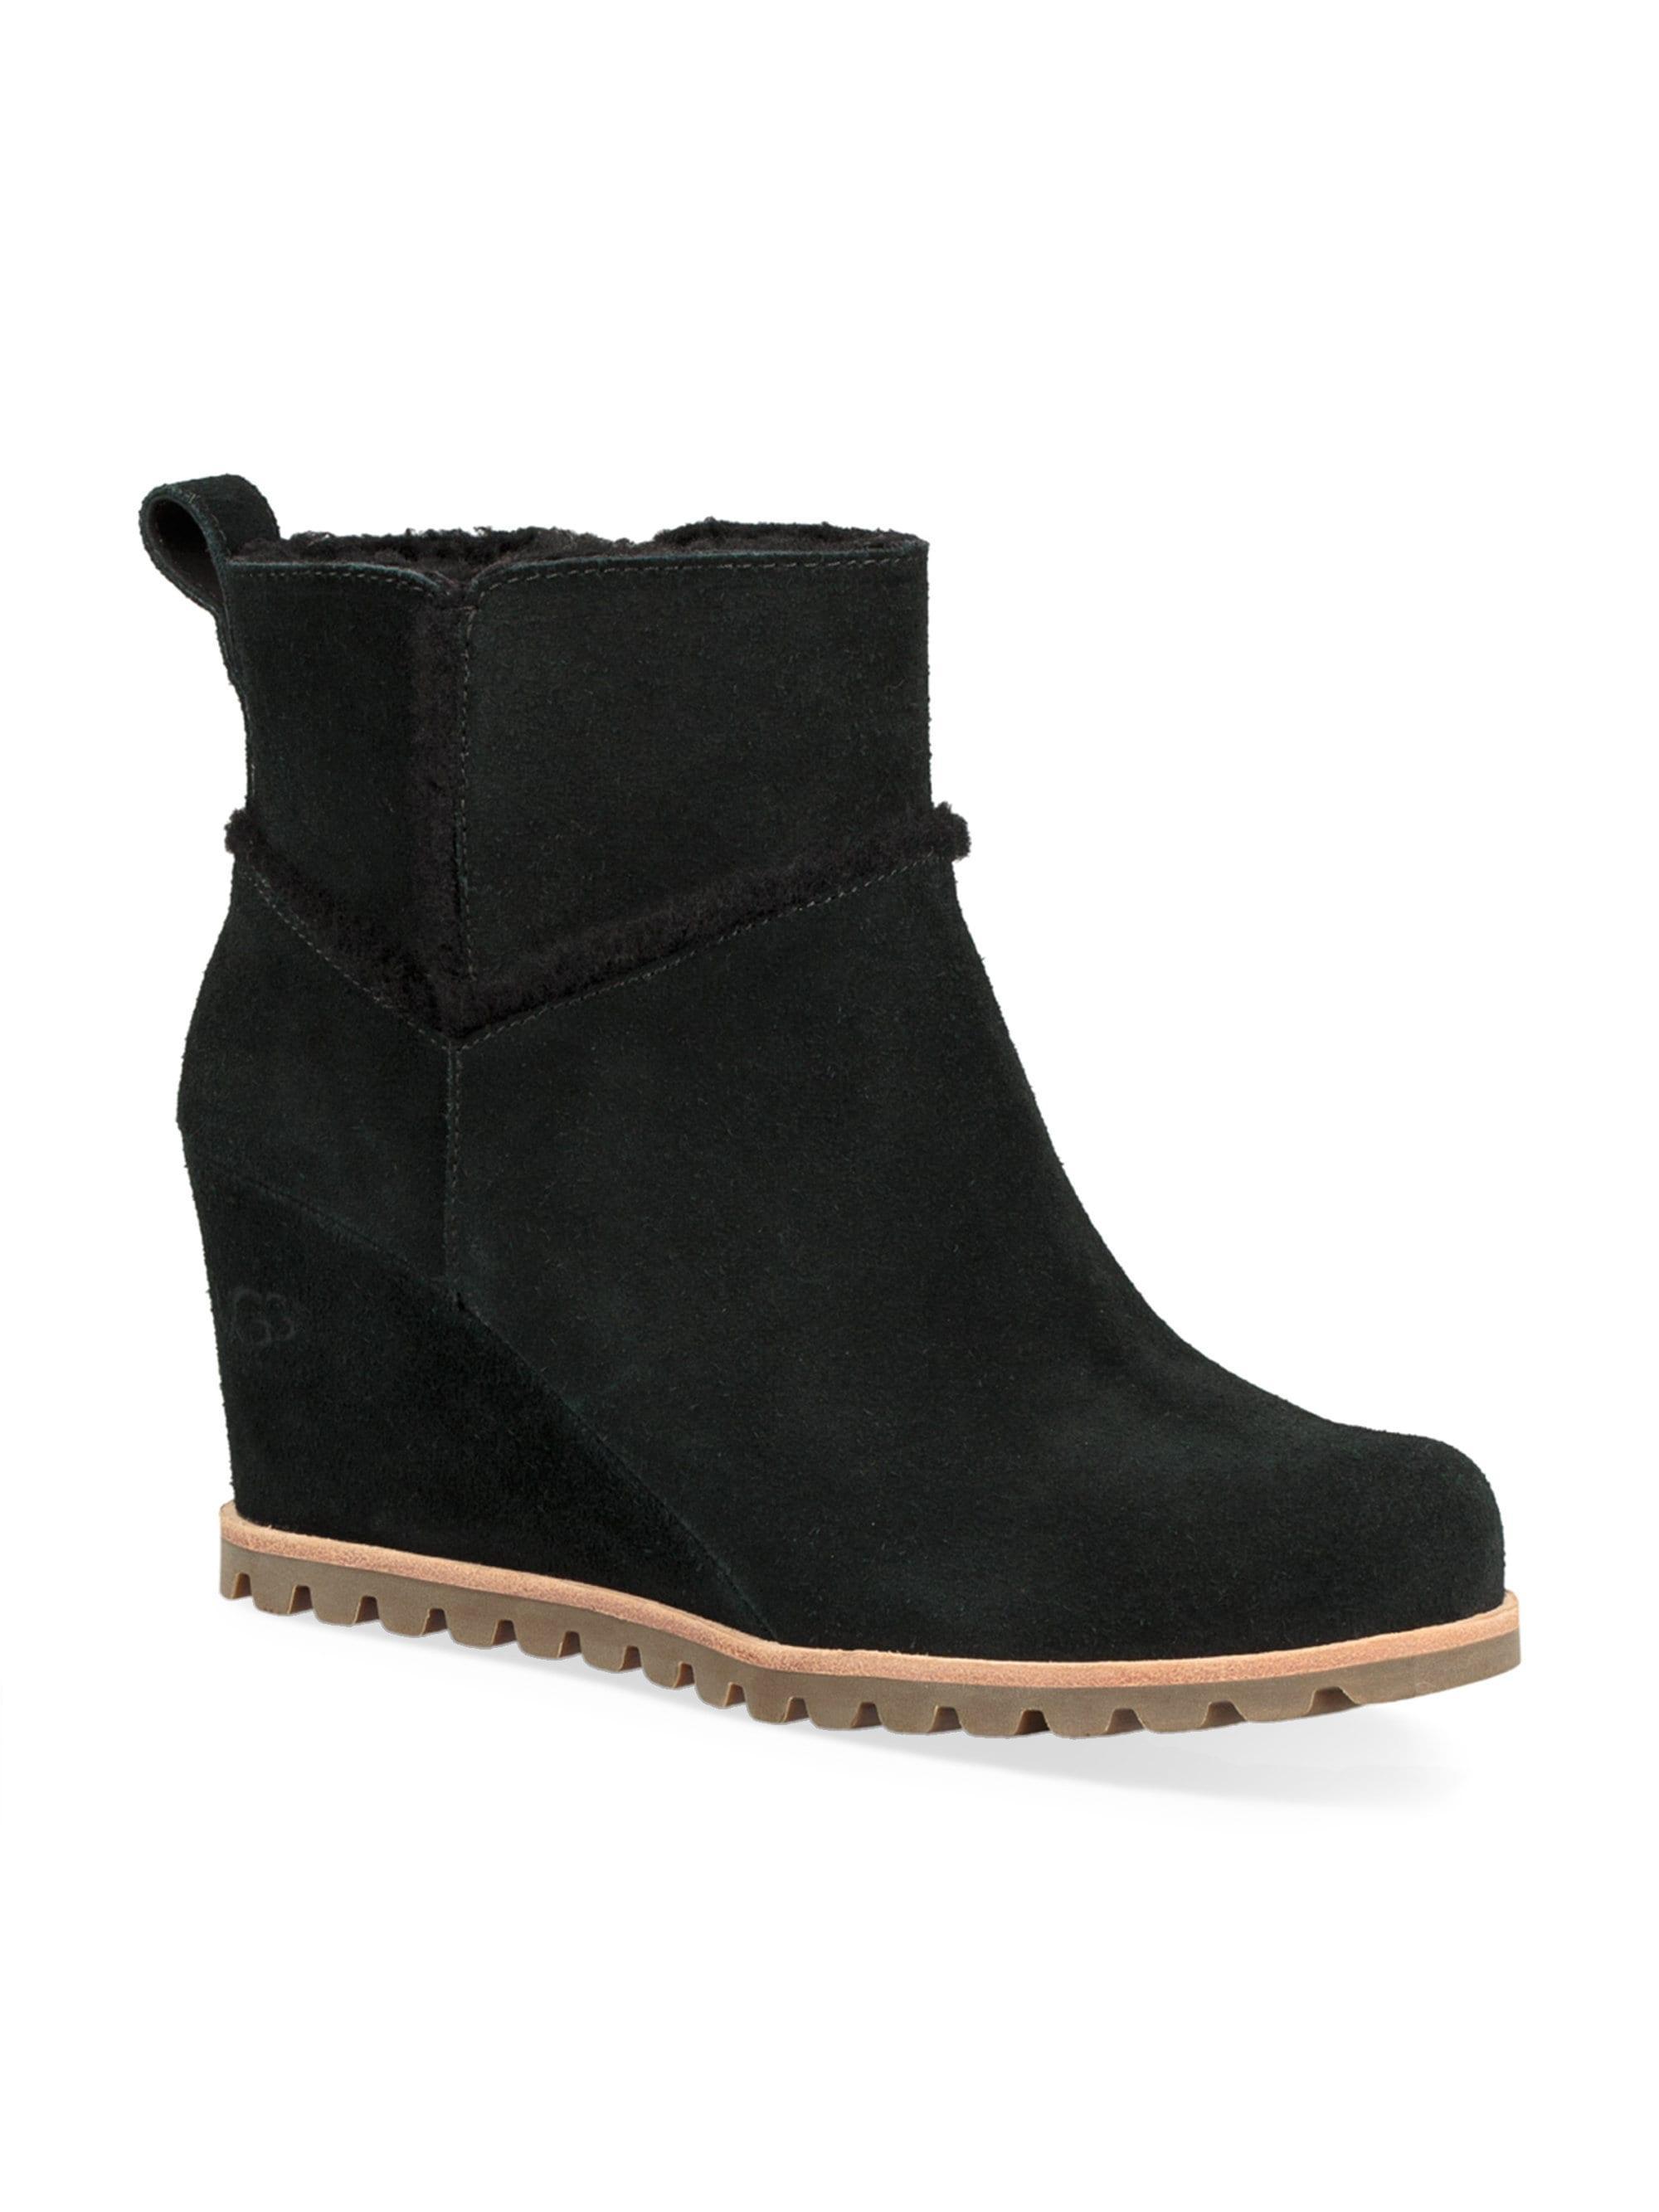 b883fe460bb Lyst - UGG Women s Marte Suede Wedge Boots - Chestnut - Size 12 in Black